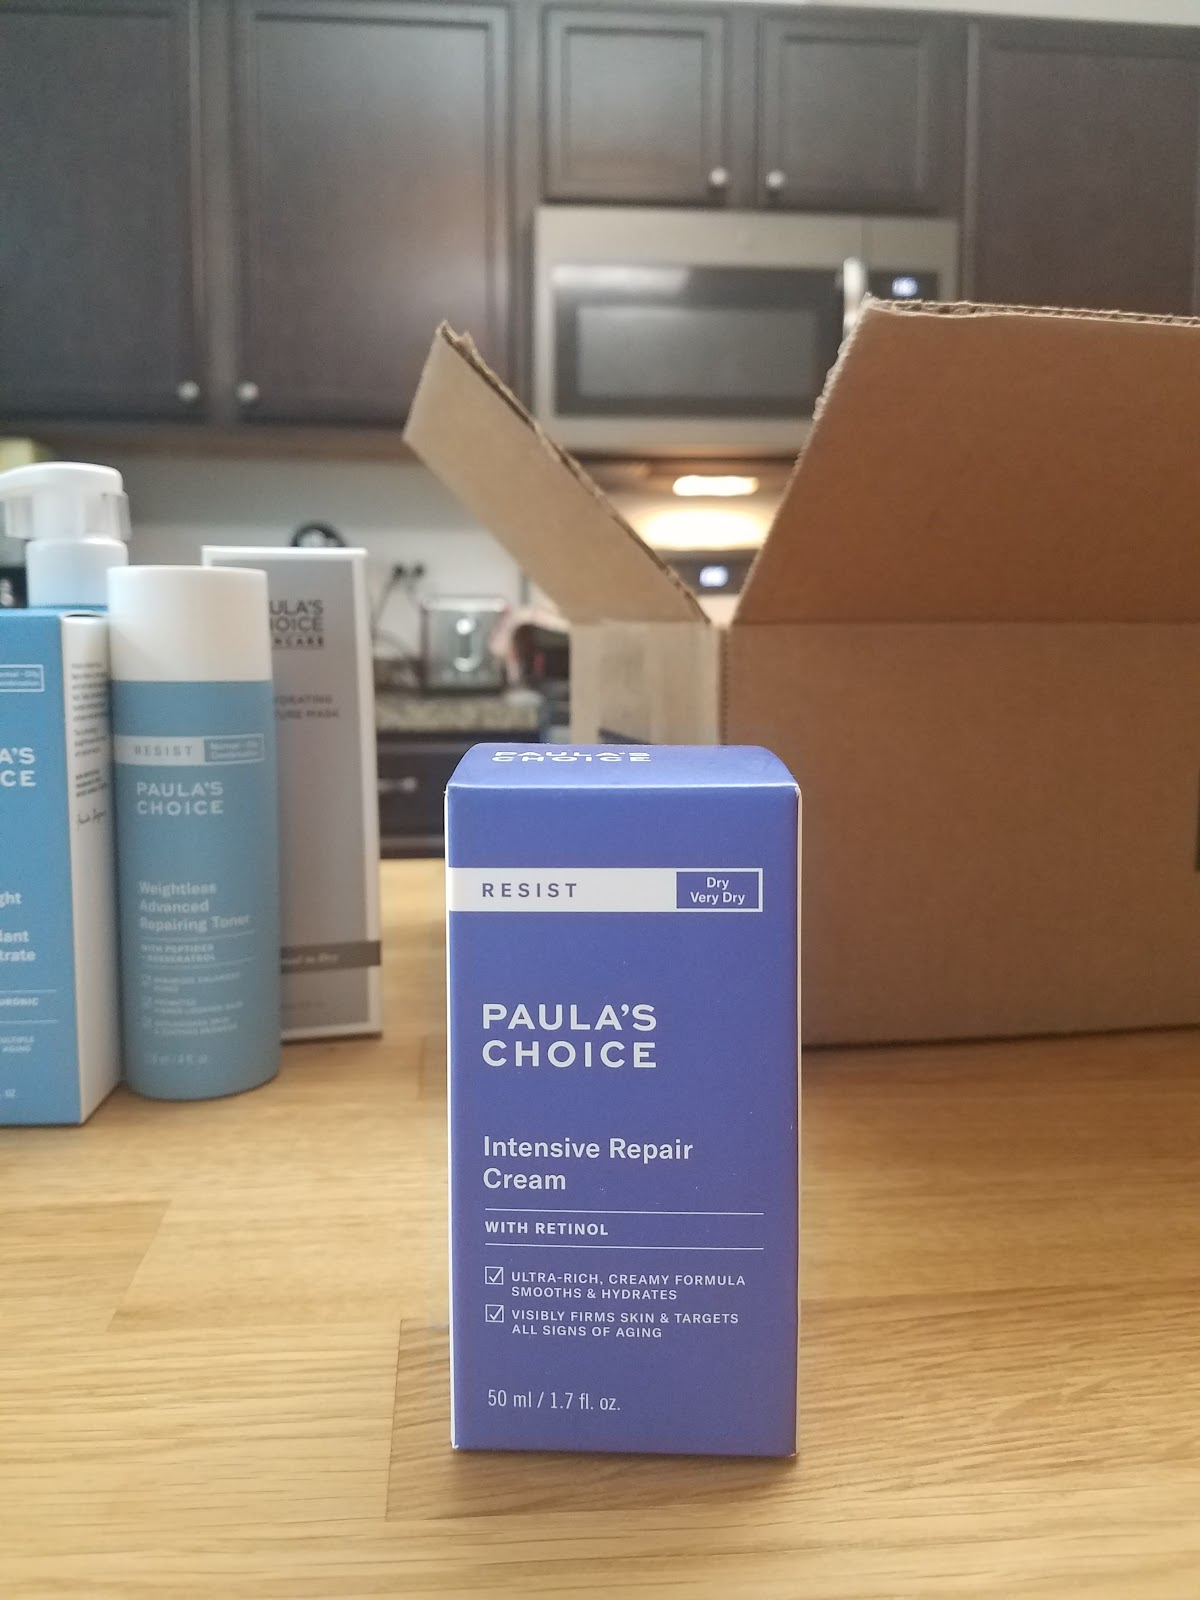 Paula's Choice Intensive Repair Cream